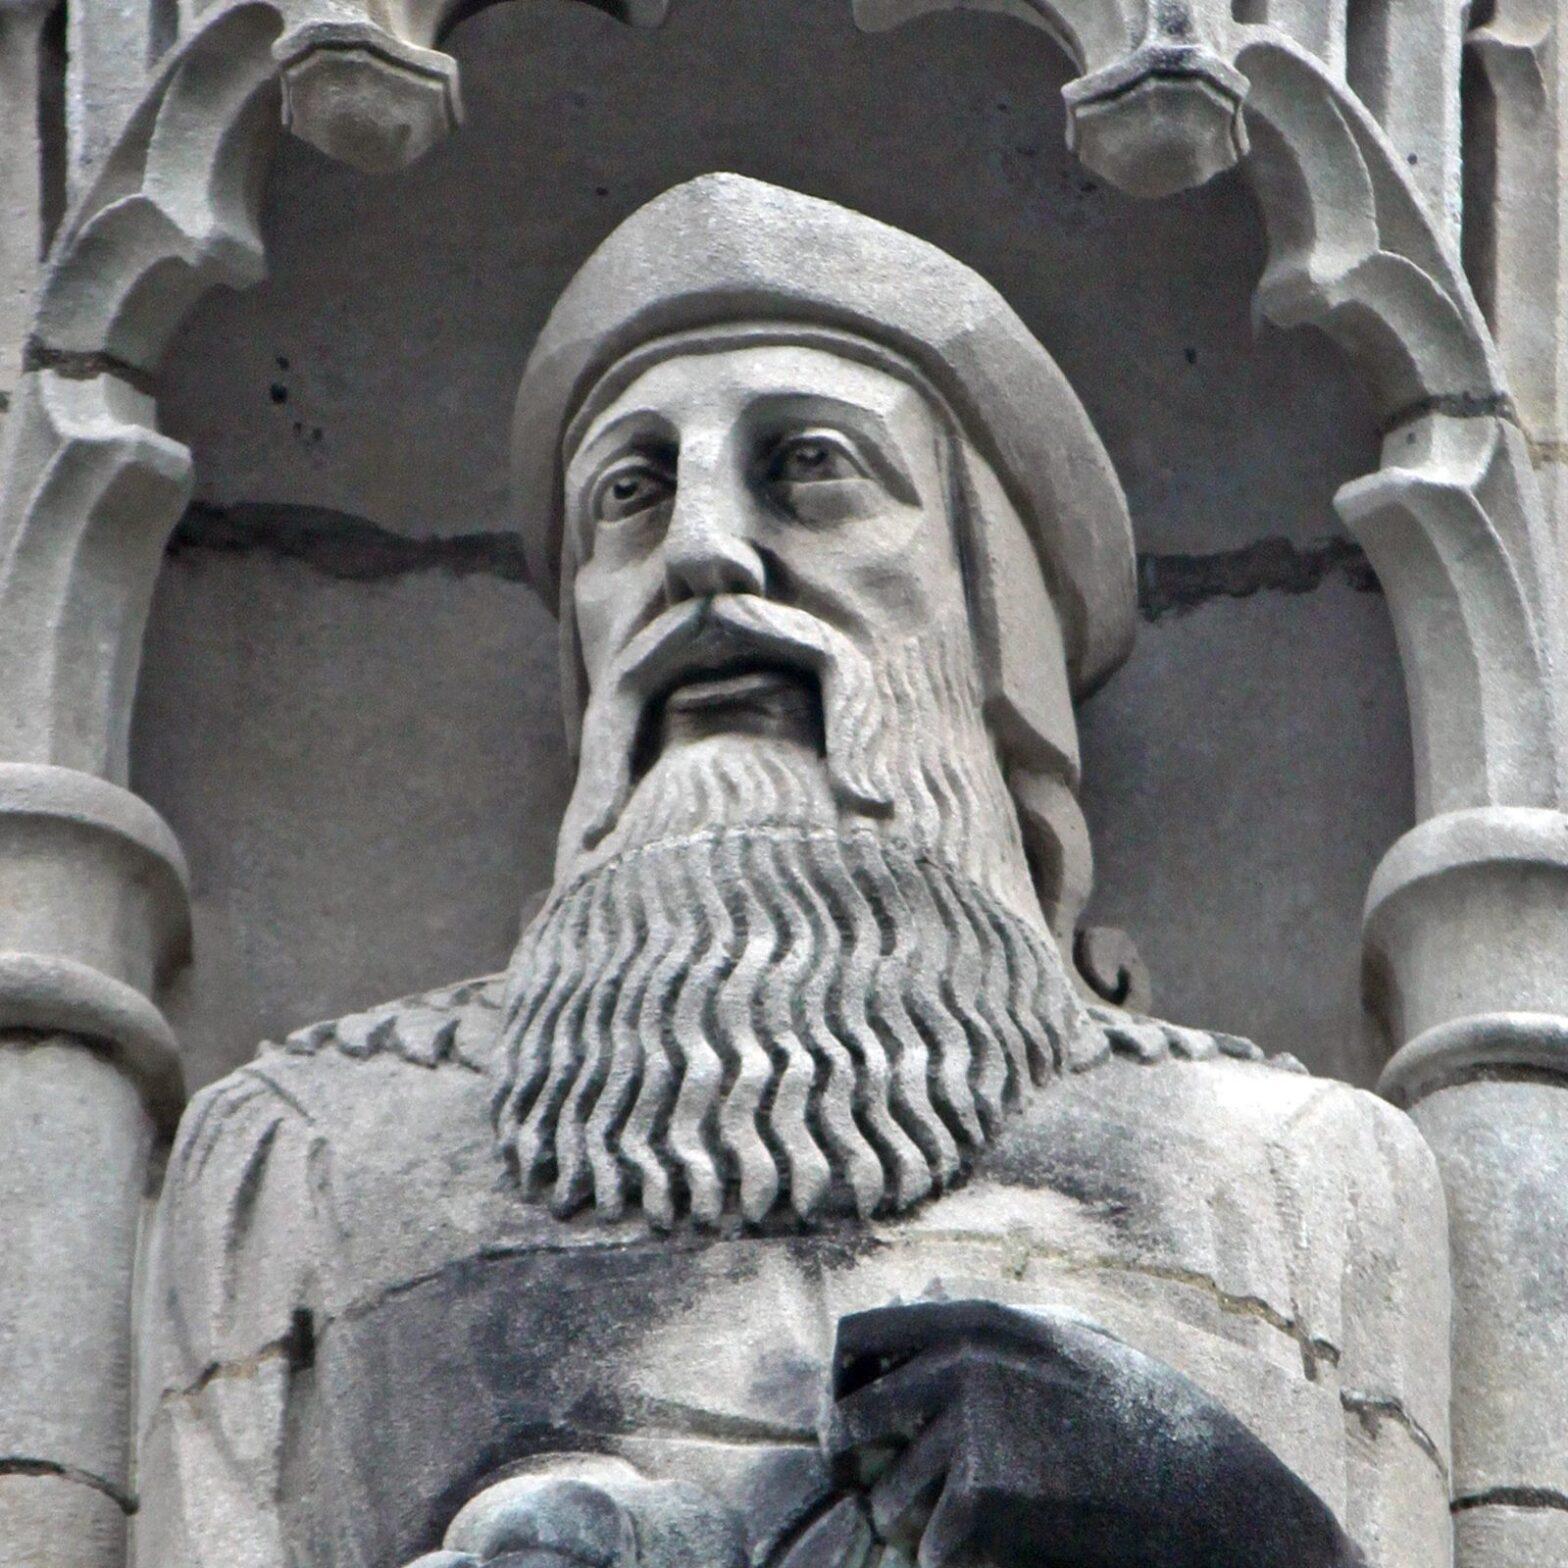 Exterior sculpture of English Reformer Thomas Cranmer in Christ Church Cranbrook in Bloomfield Hills, Michigan.